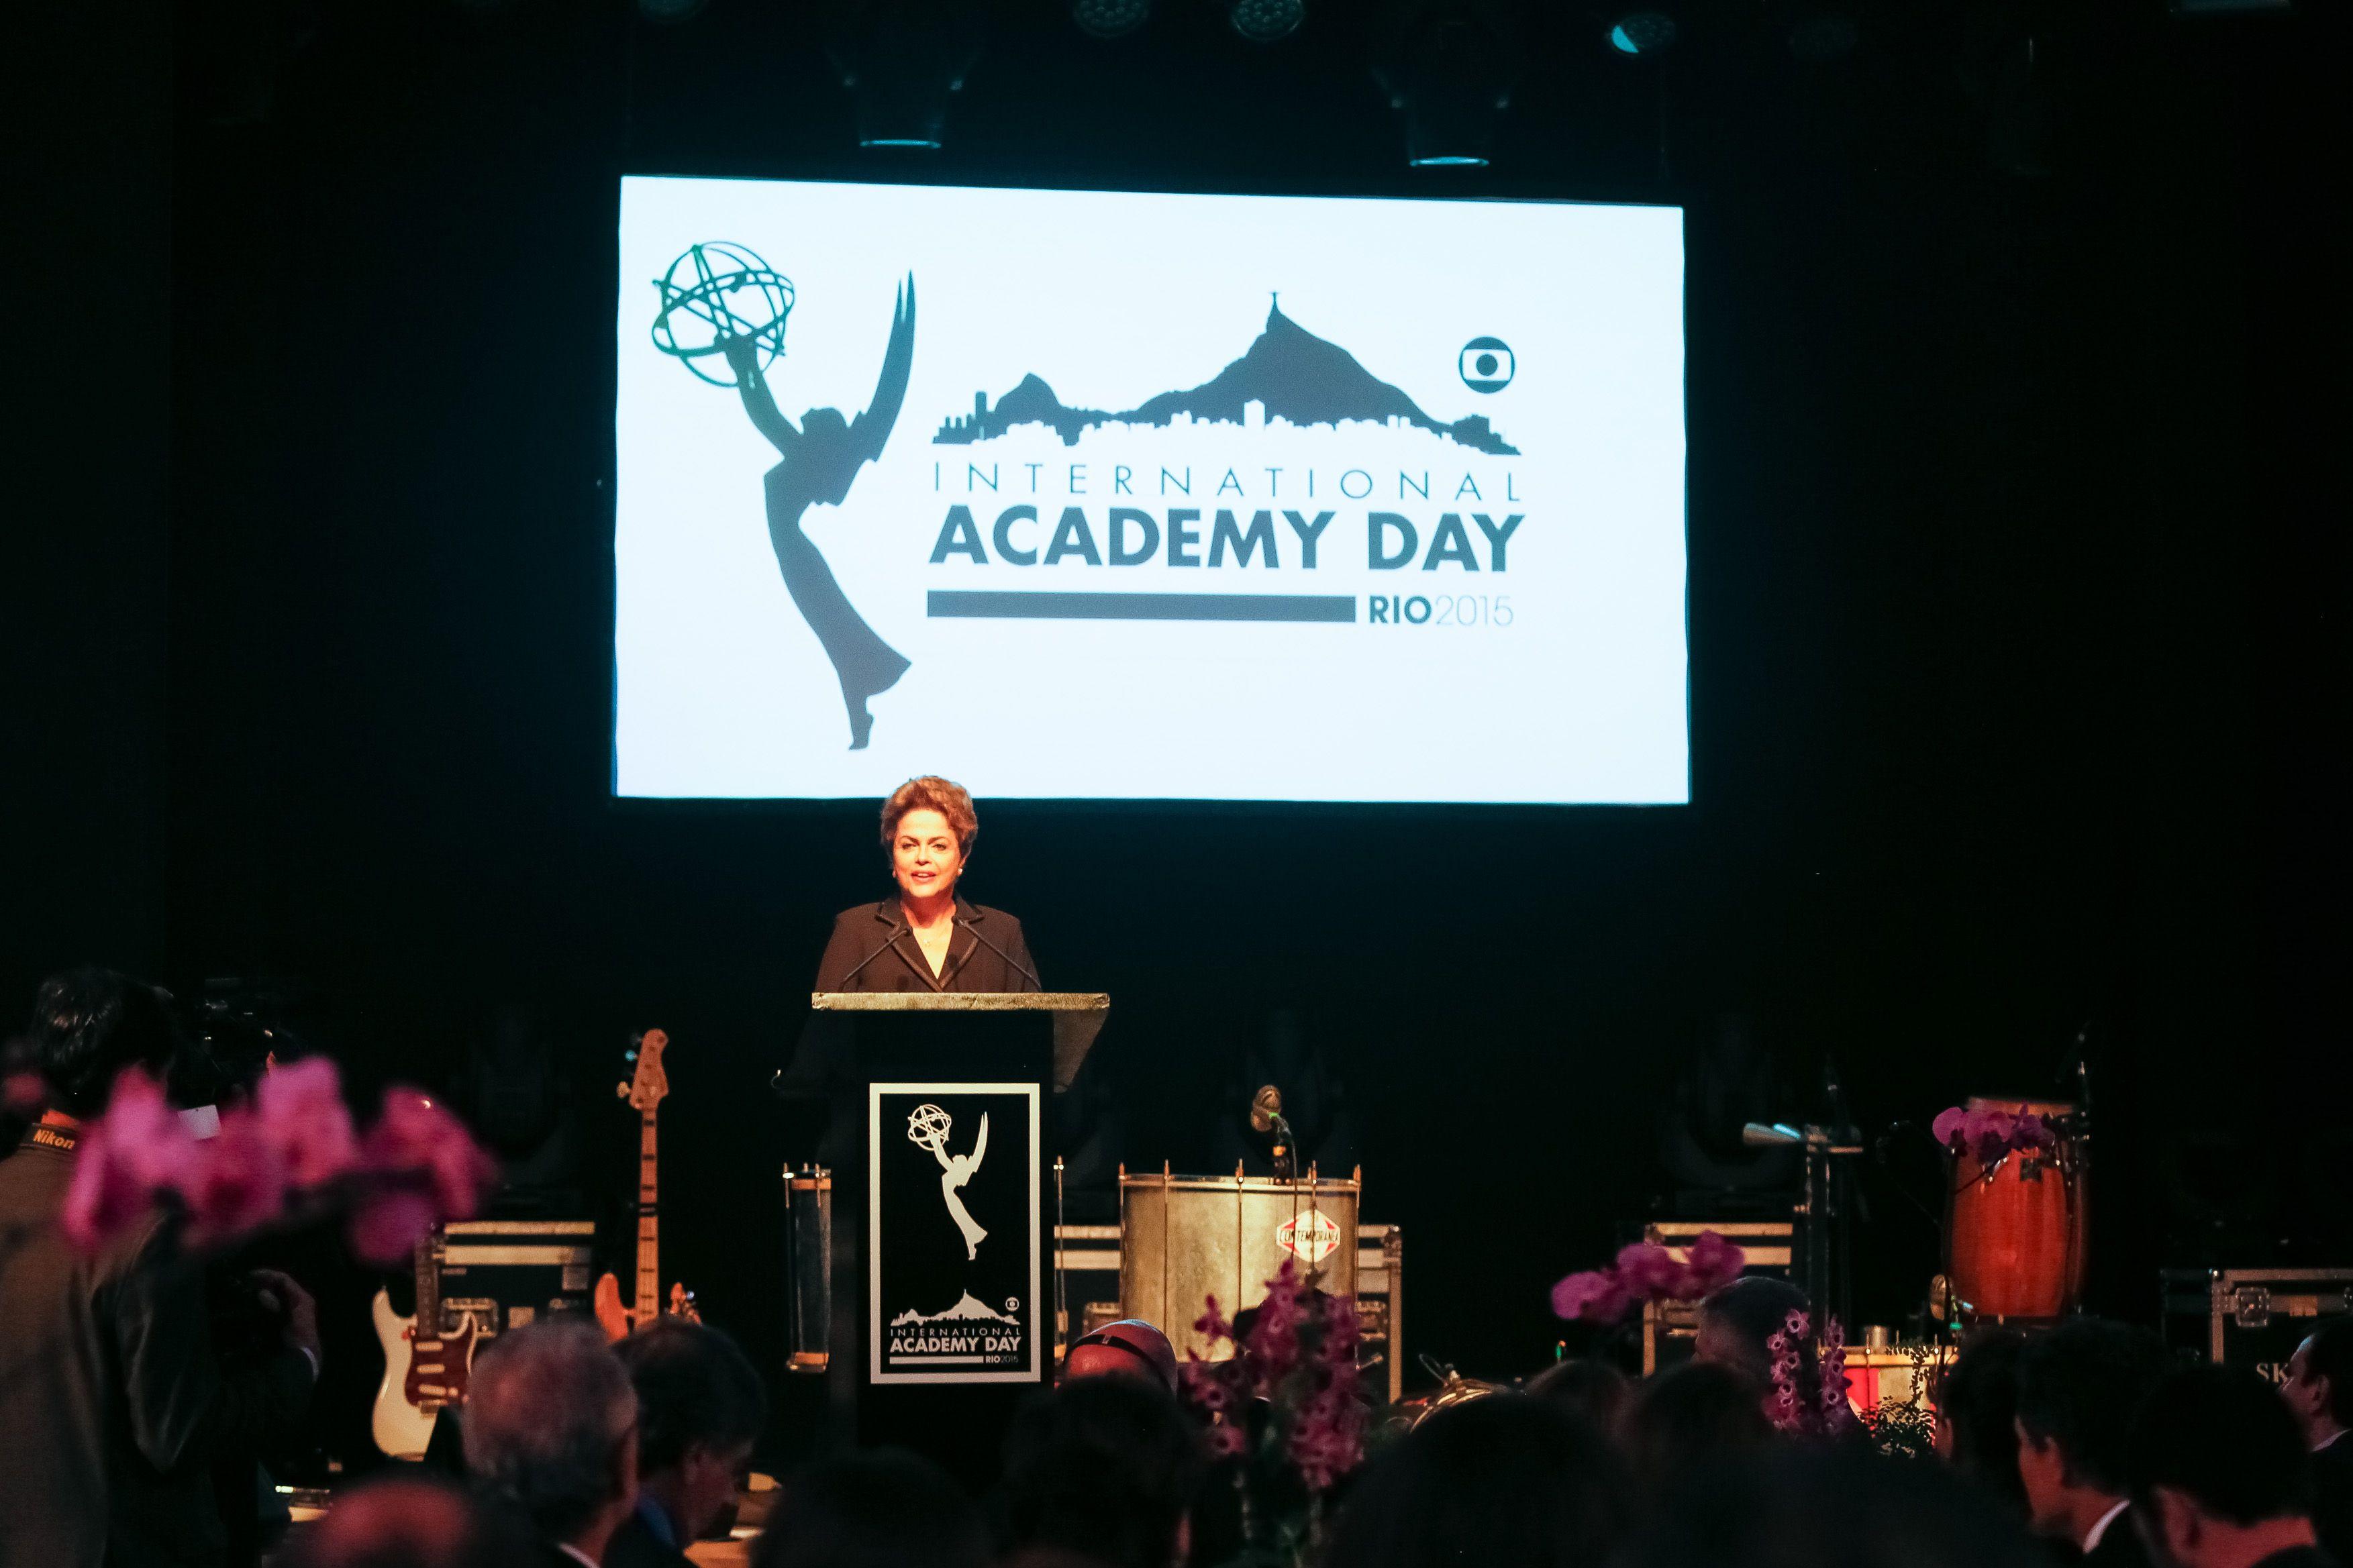 dilma rousseff durante o 2015 international academy day.jpg